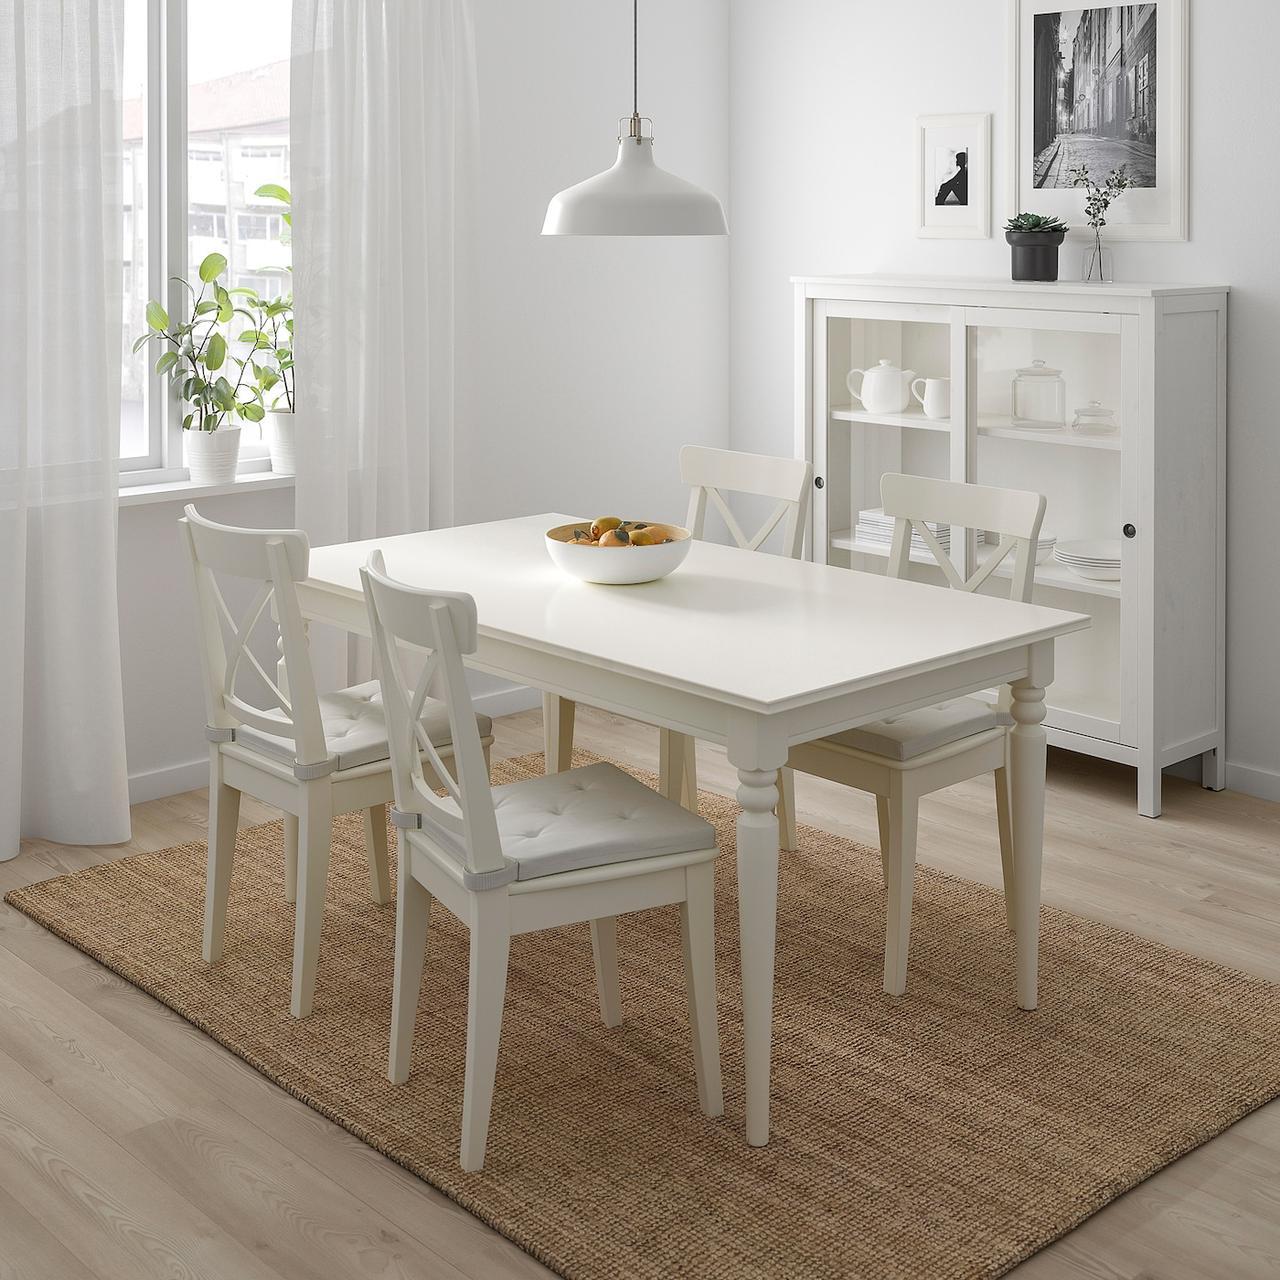 ЮСТИНА Подушка на стул, неокрашенный, 35/42x40x4.0 см - фото 2